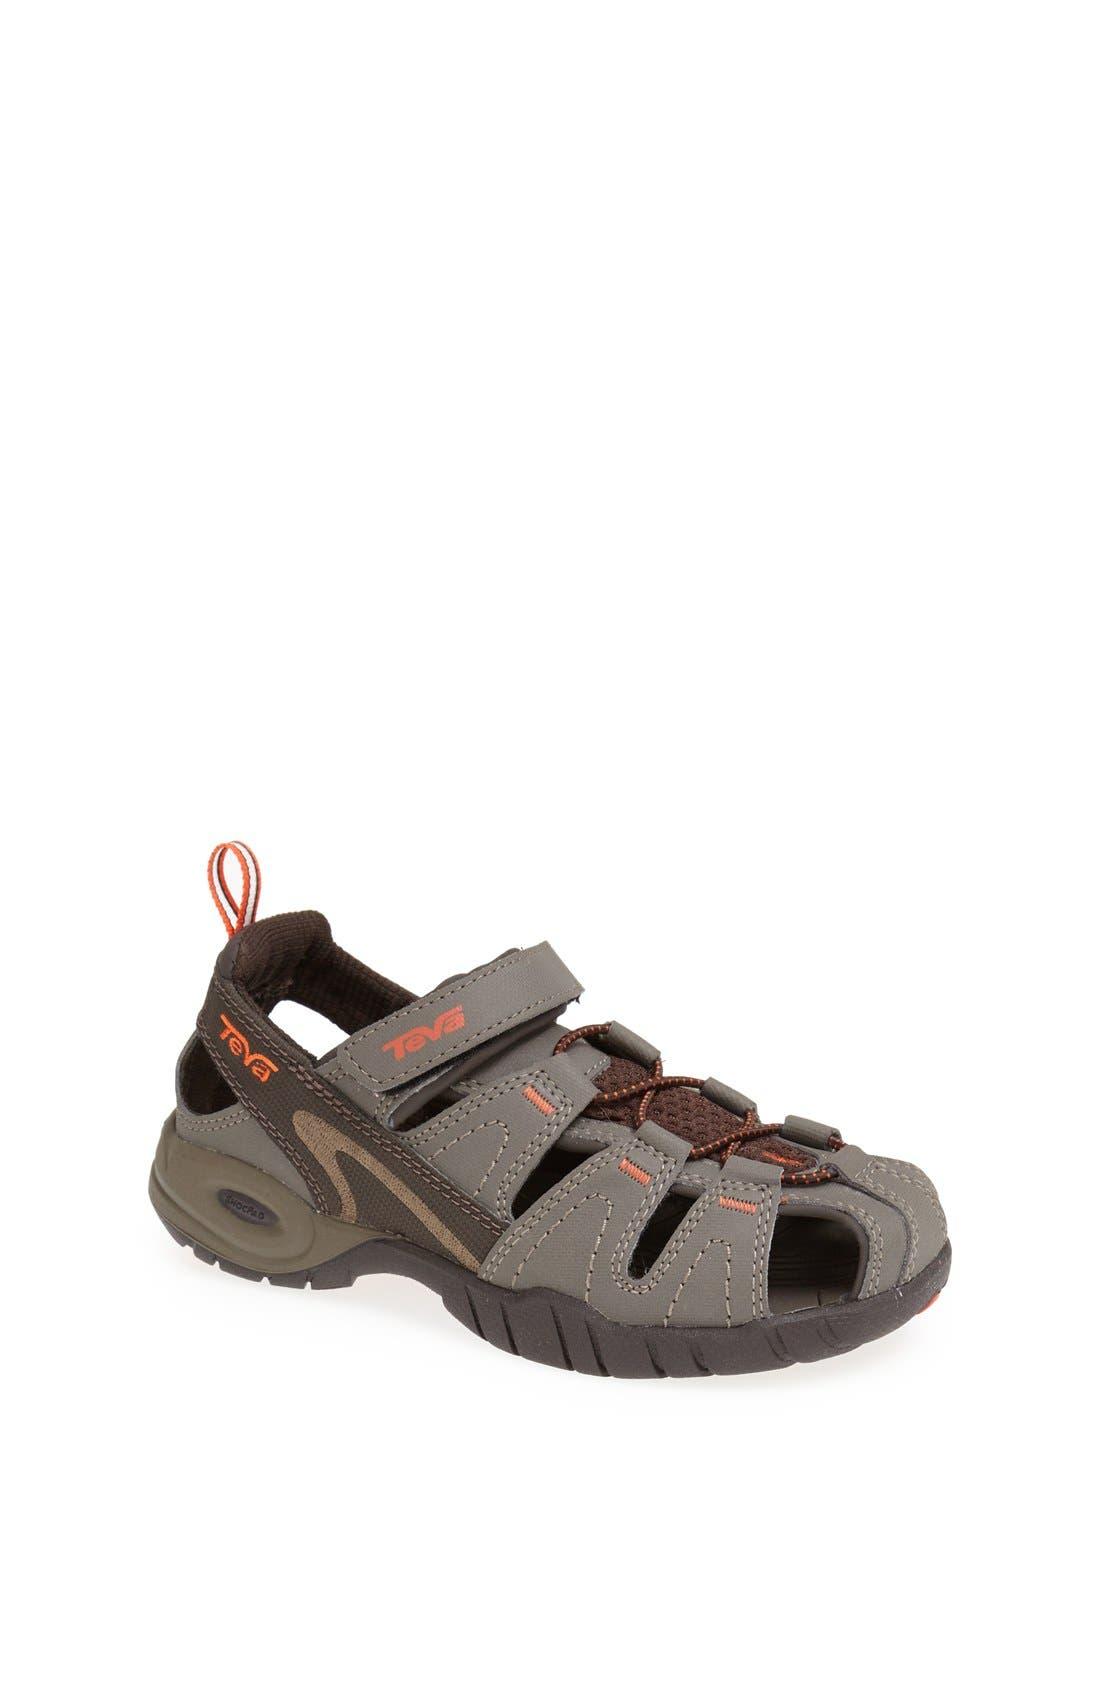 Main Image - Teva 'Dozer 3' Sandal (Toddler, Little Kid & Big Kid)